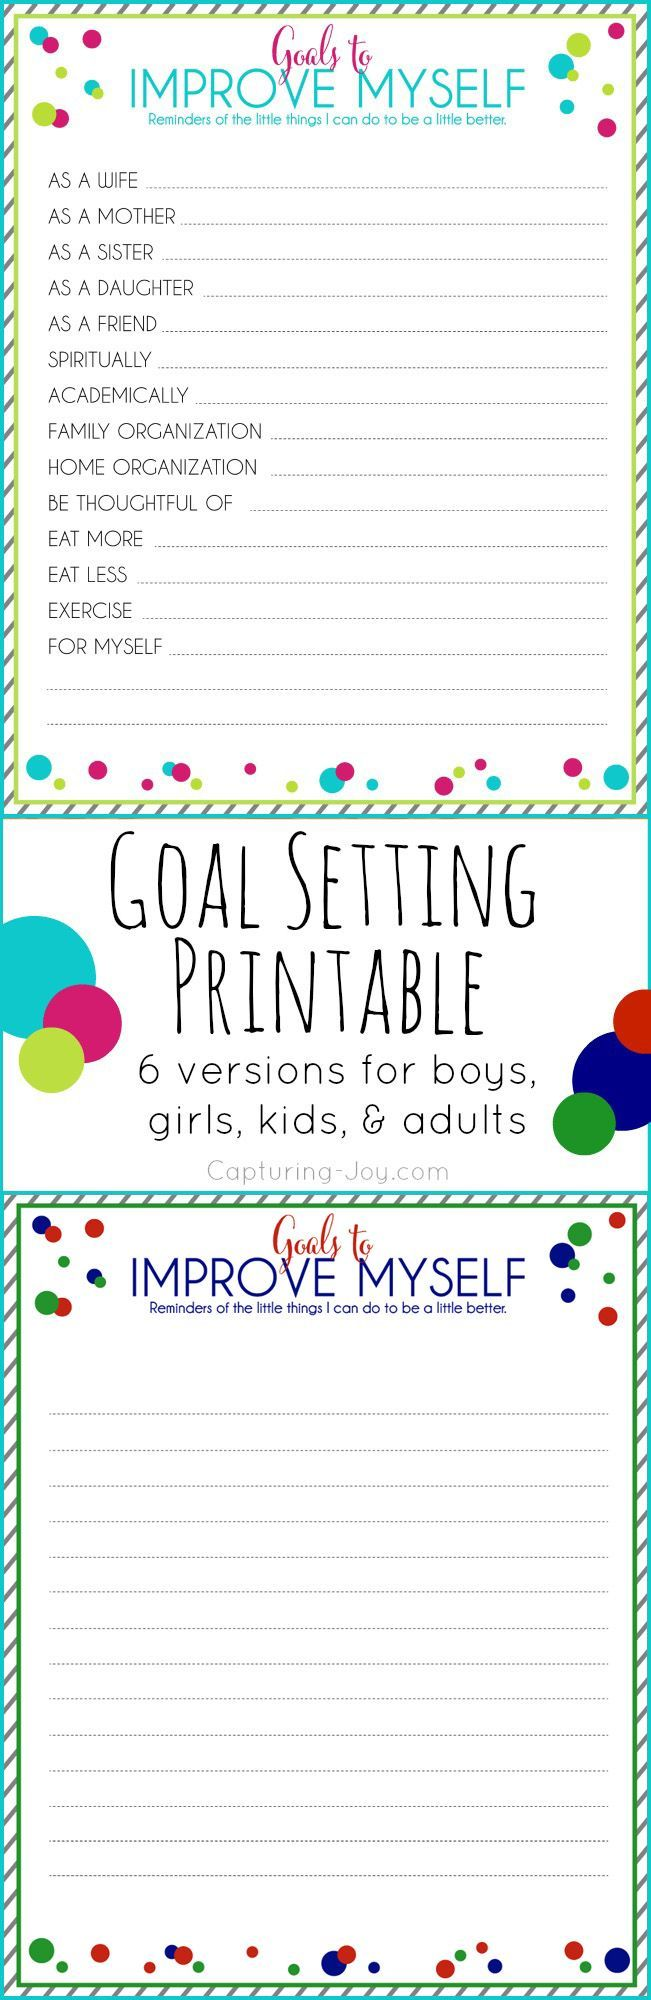 Goals to Improve myself Free Printable Goals printable